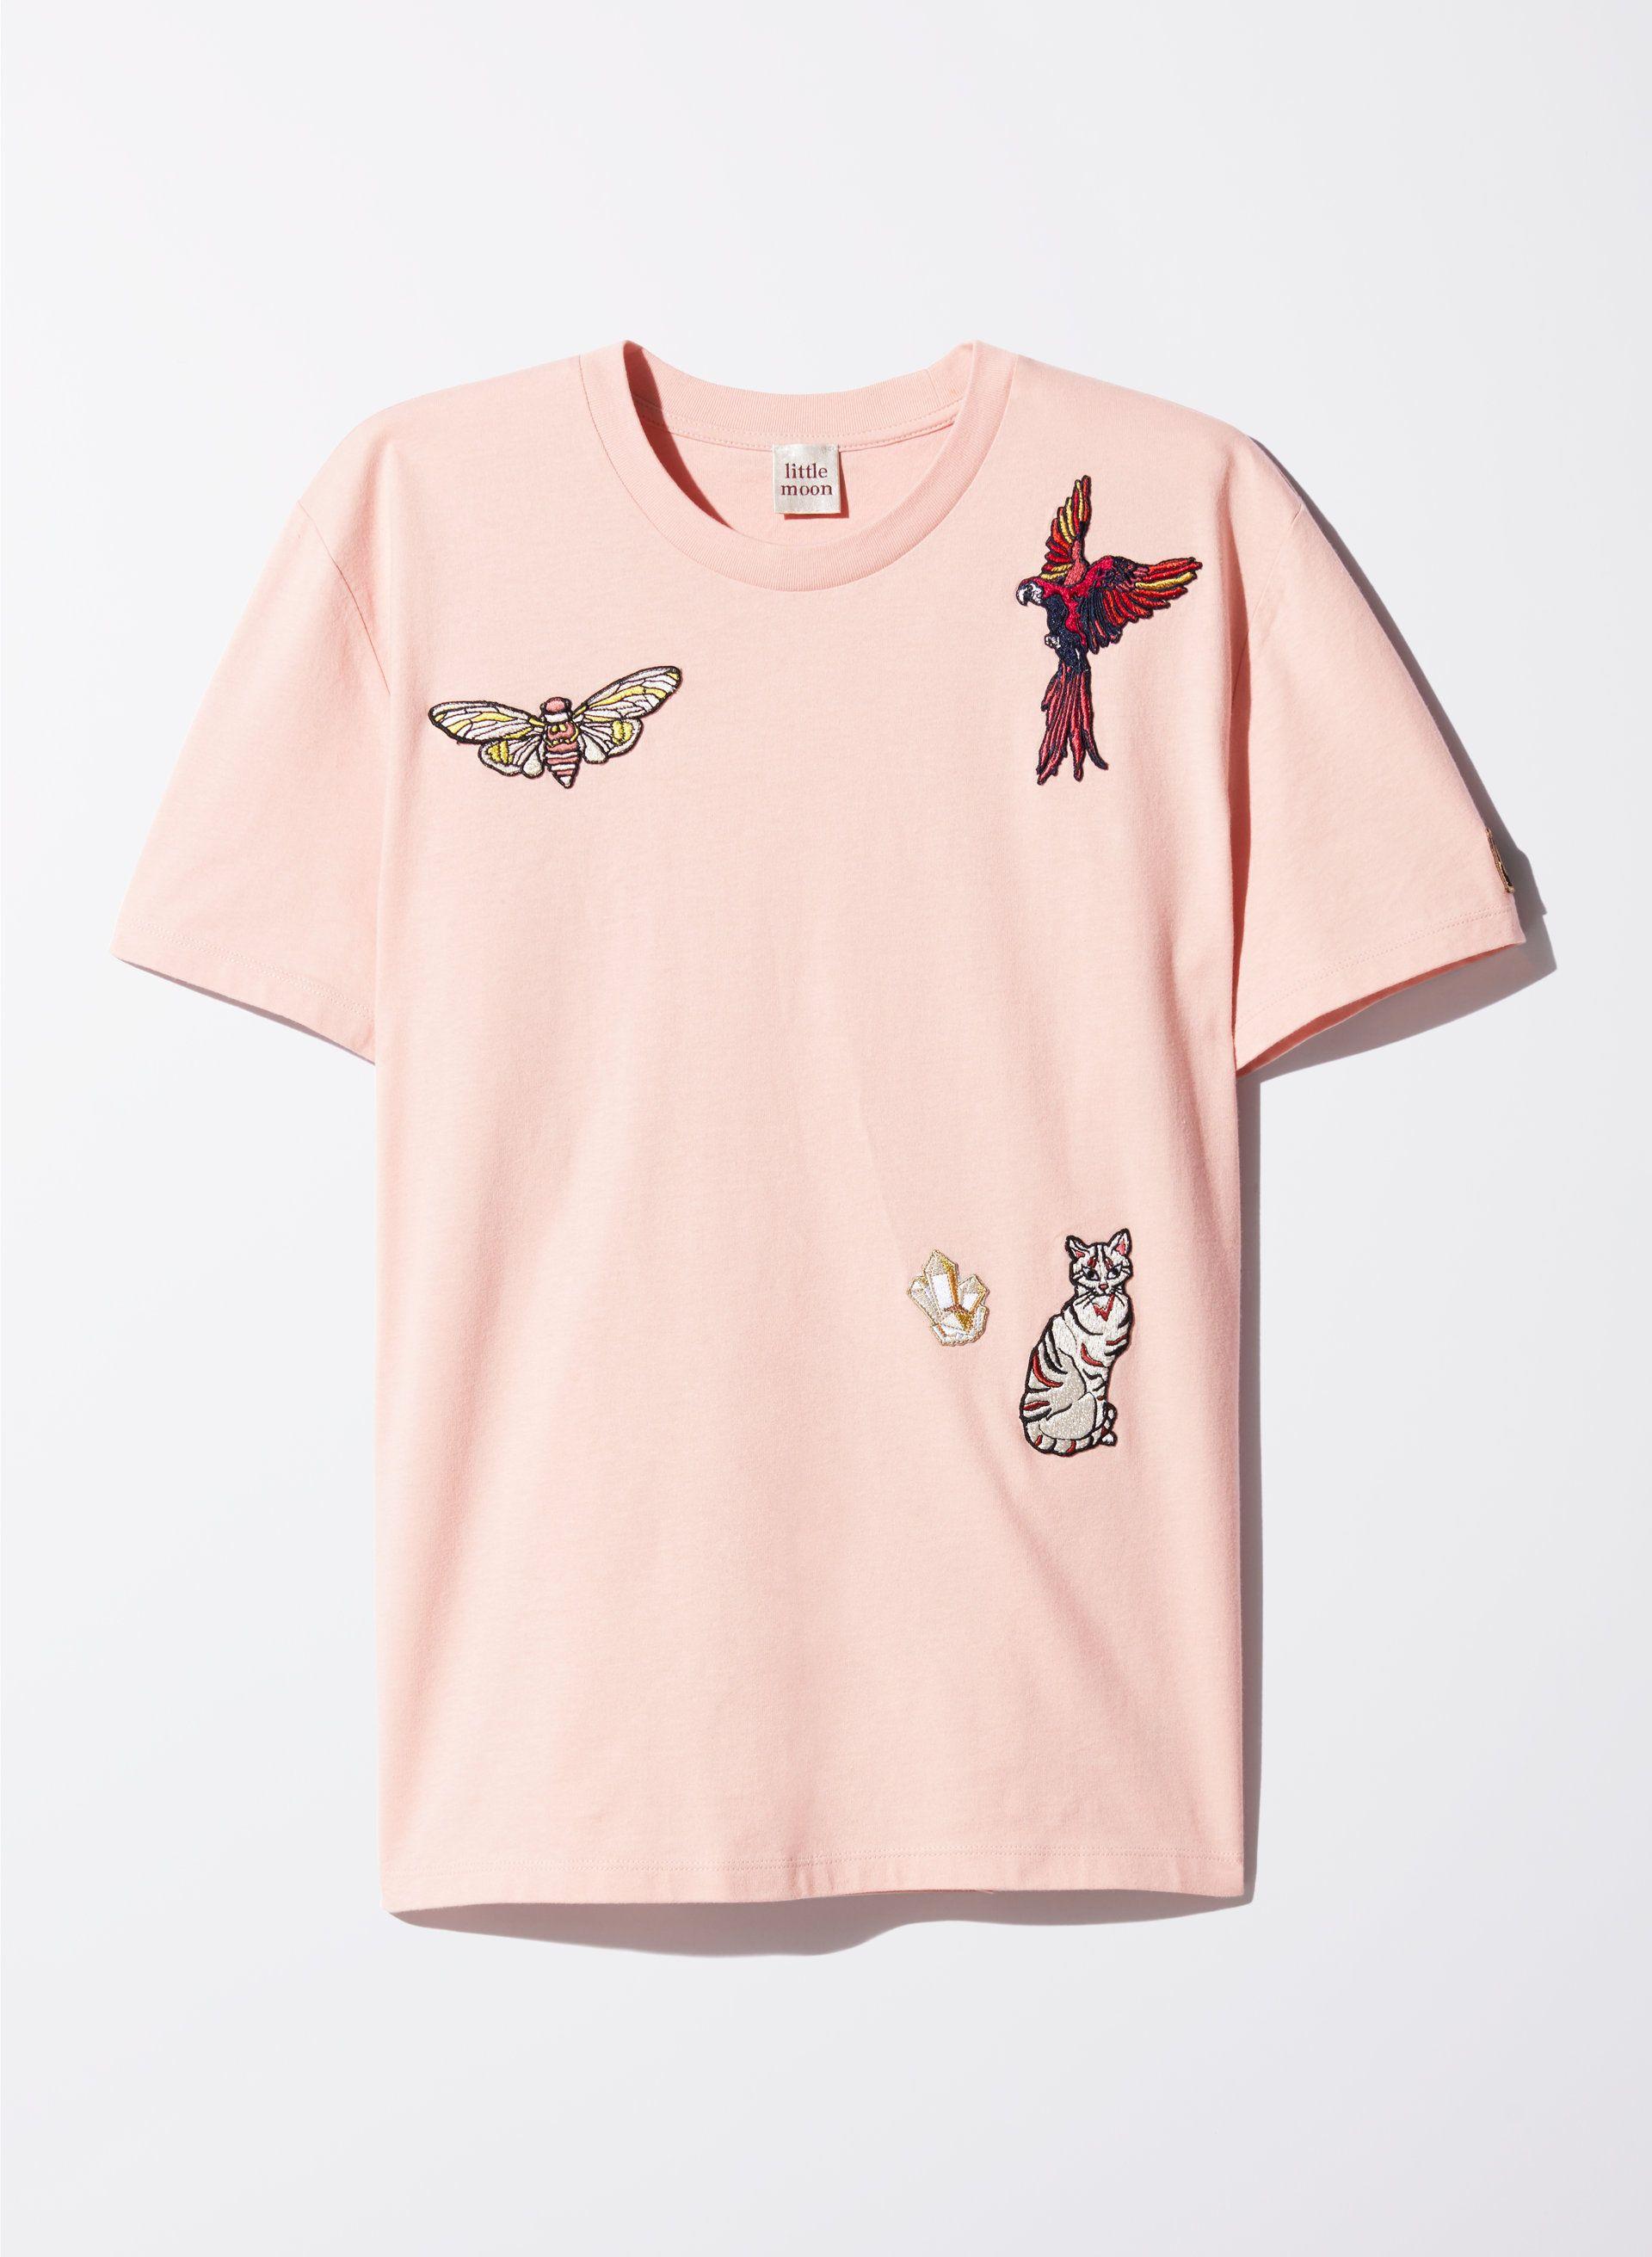 310e8134b Little Moon AGERATUM T-SHIRT   Aritzia   TOPS   Mens tops, T shirt, Tops